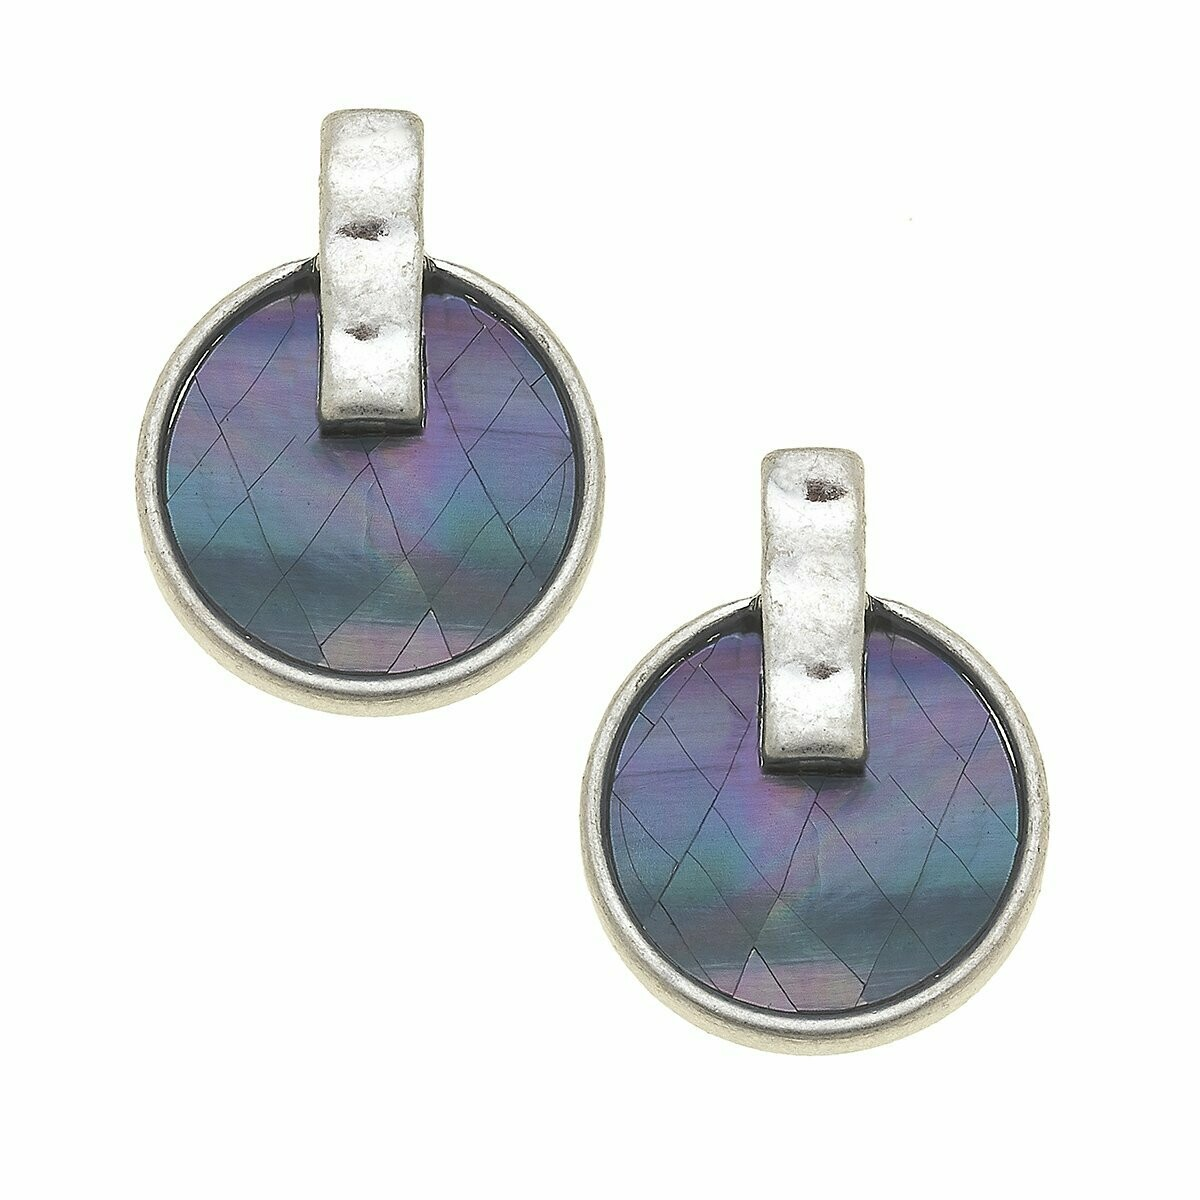 Siena Stud Earrings in Grey Mother of Pearl Shell